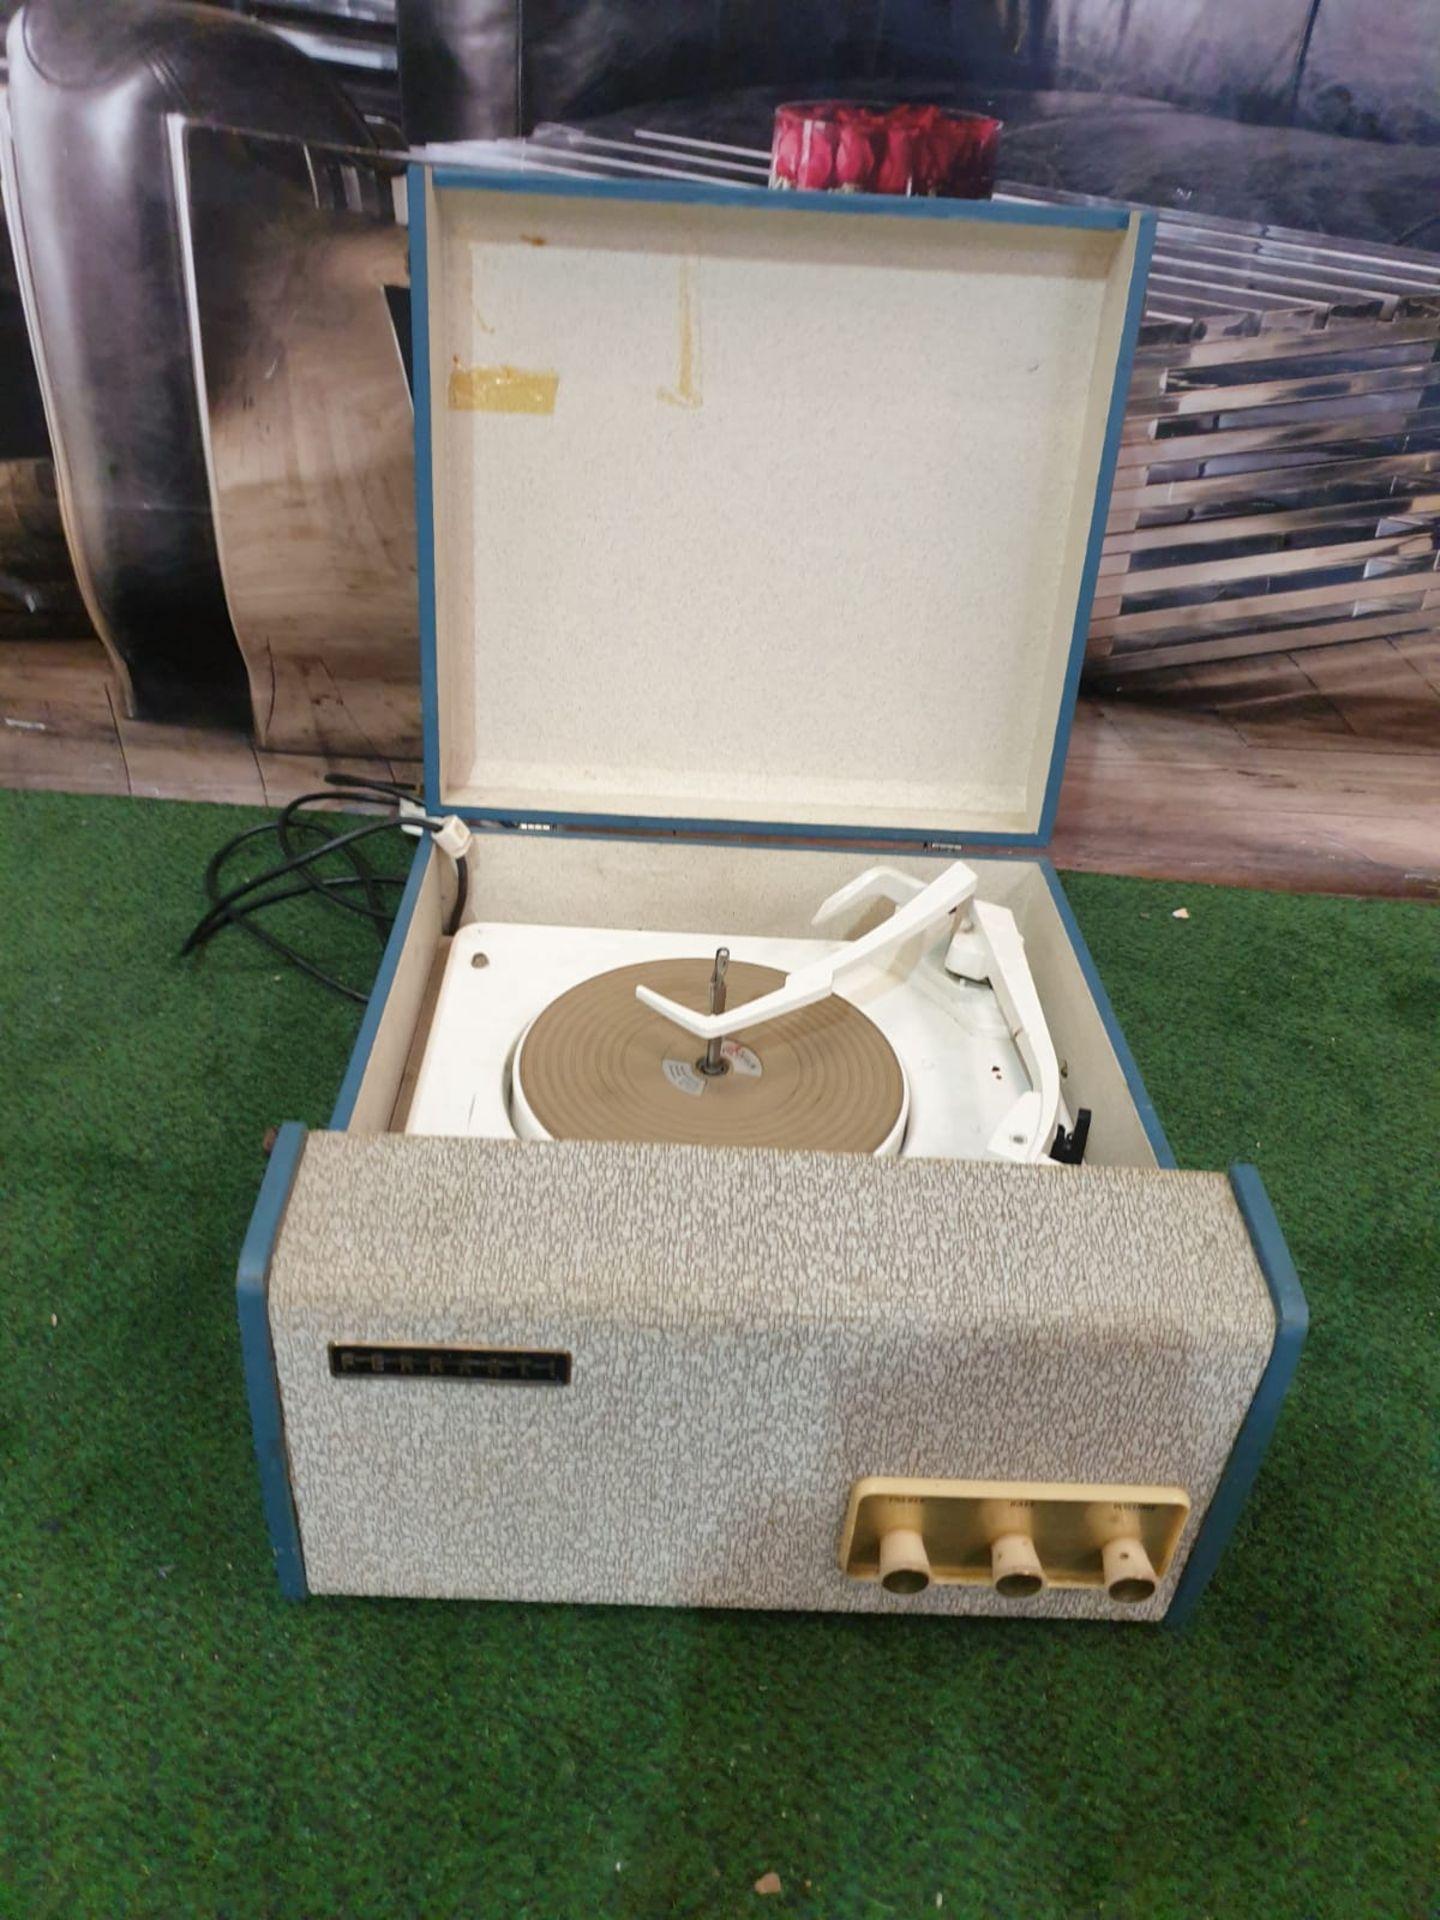 Travel record Player Blue Case Made By Ferranti Circa 1958 Ferranti or Ferranti International plc